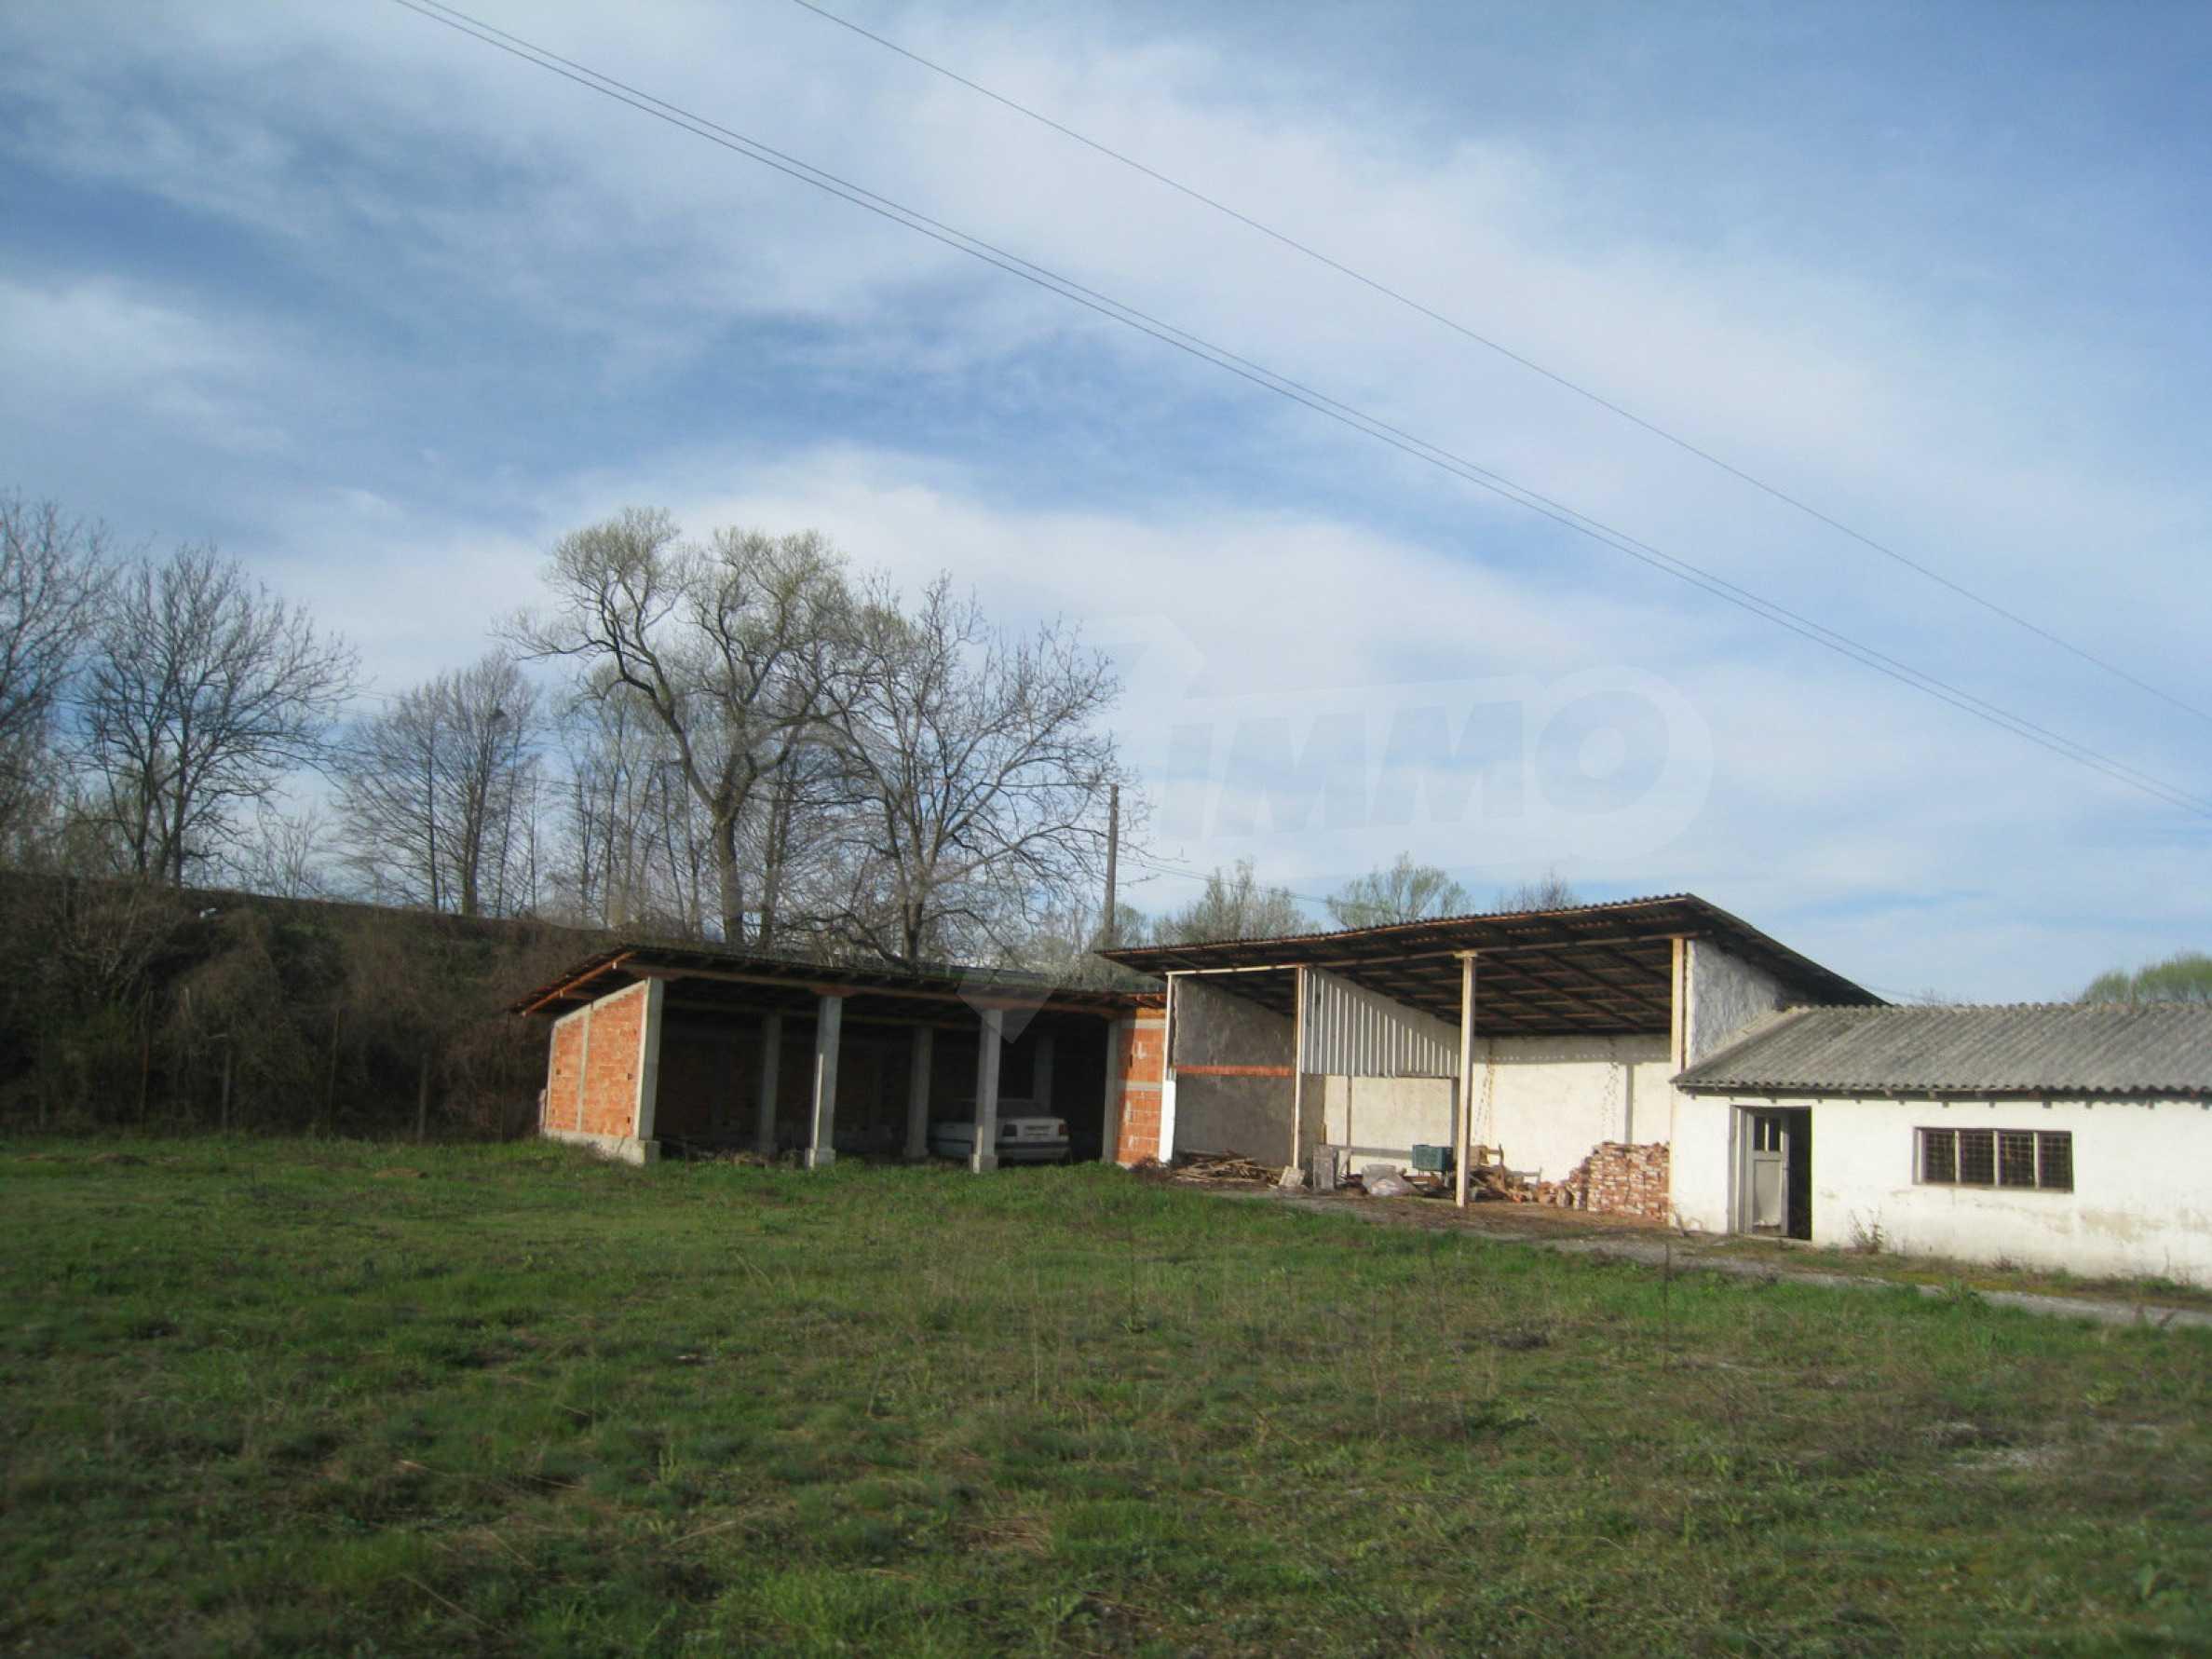 Fishpond, warehouses, residential areas and asphalt ground near Montana 31